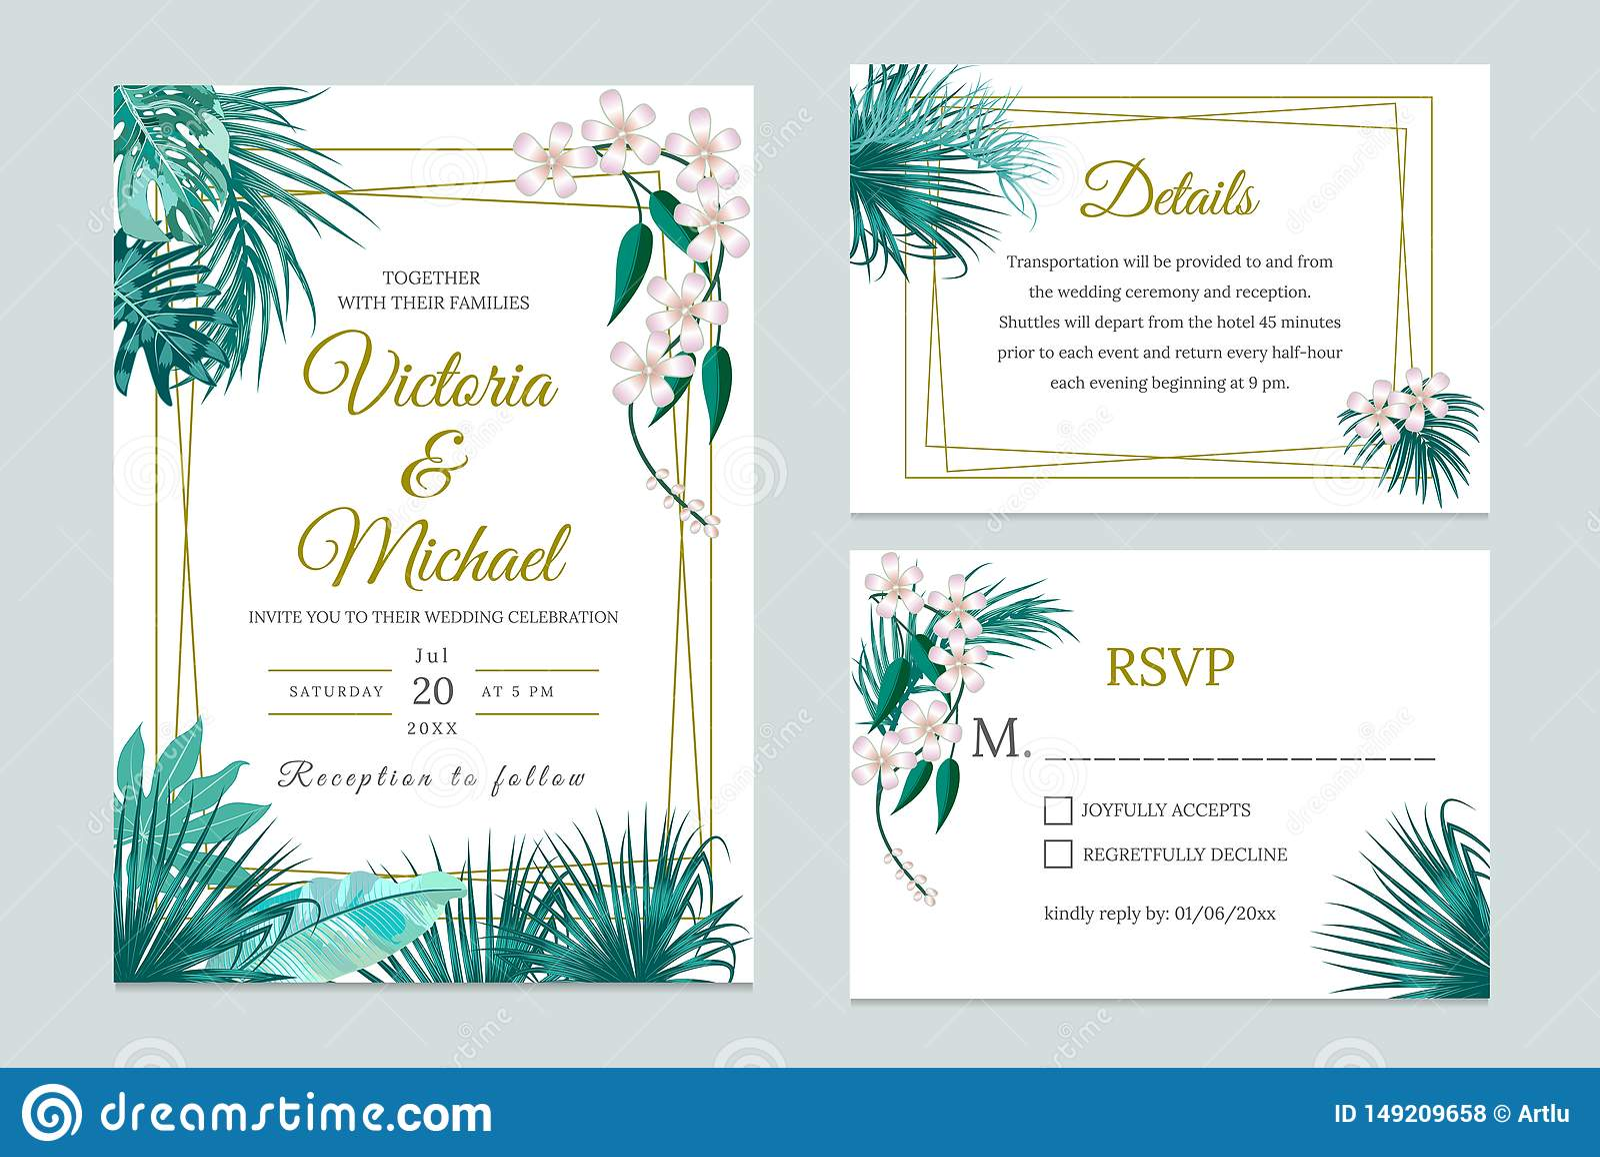 Wedding Invitation Card Design, Floral Invite. Tropical Jungle Leaves  Elegant Frame Set Stock Vector - Illustration of date, isolated: 149209658